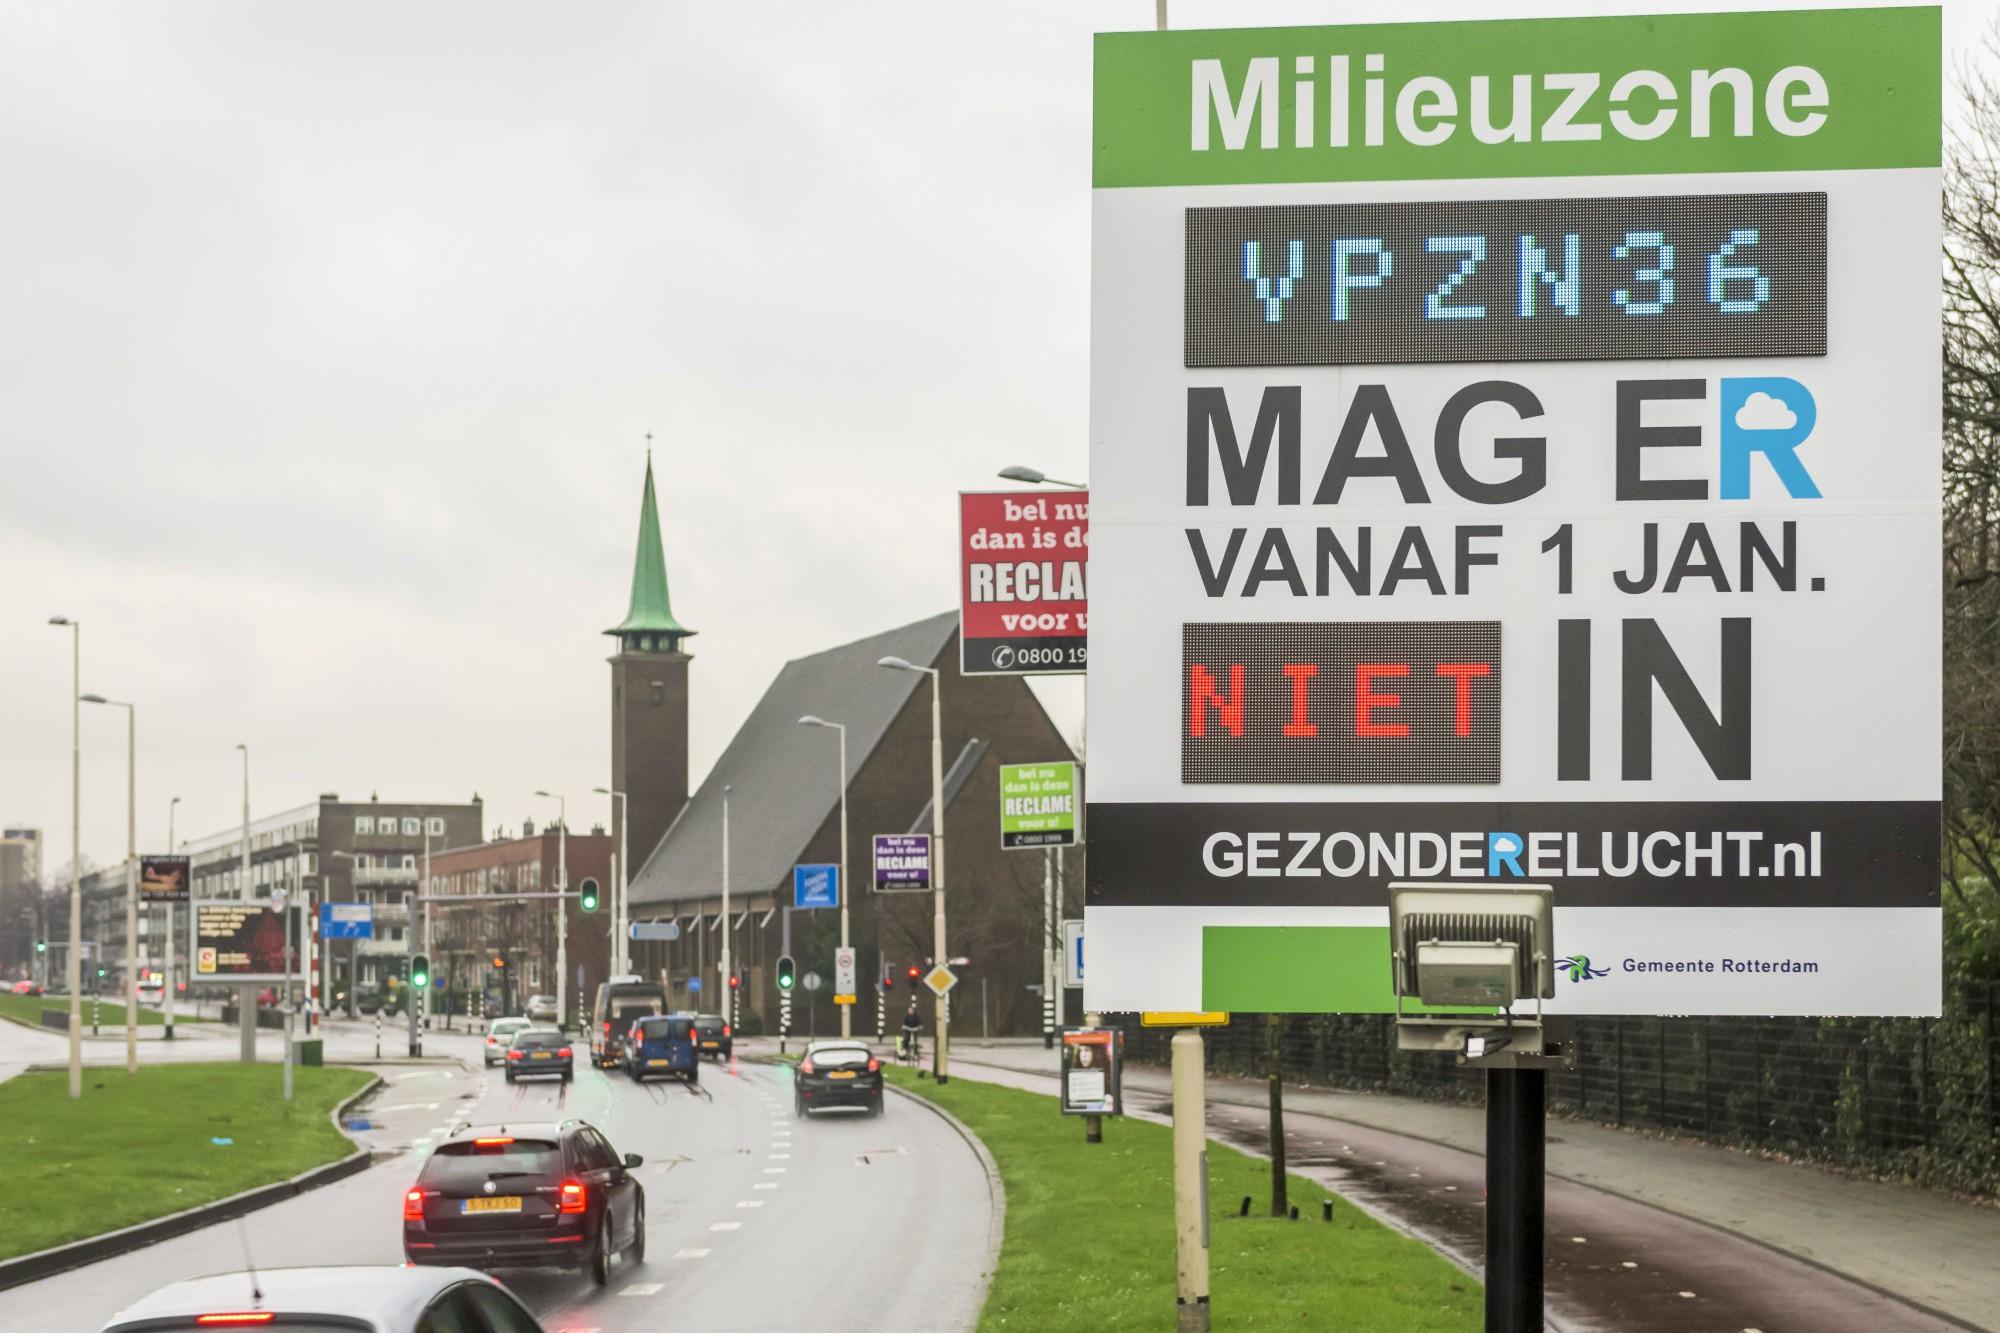 Milieuzone Rotterdam